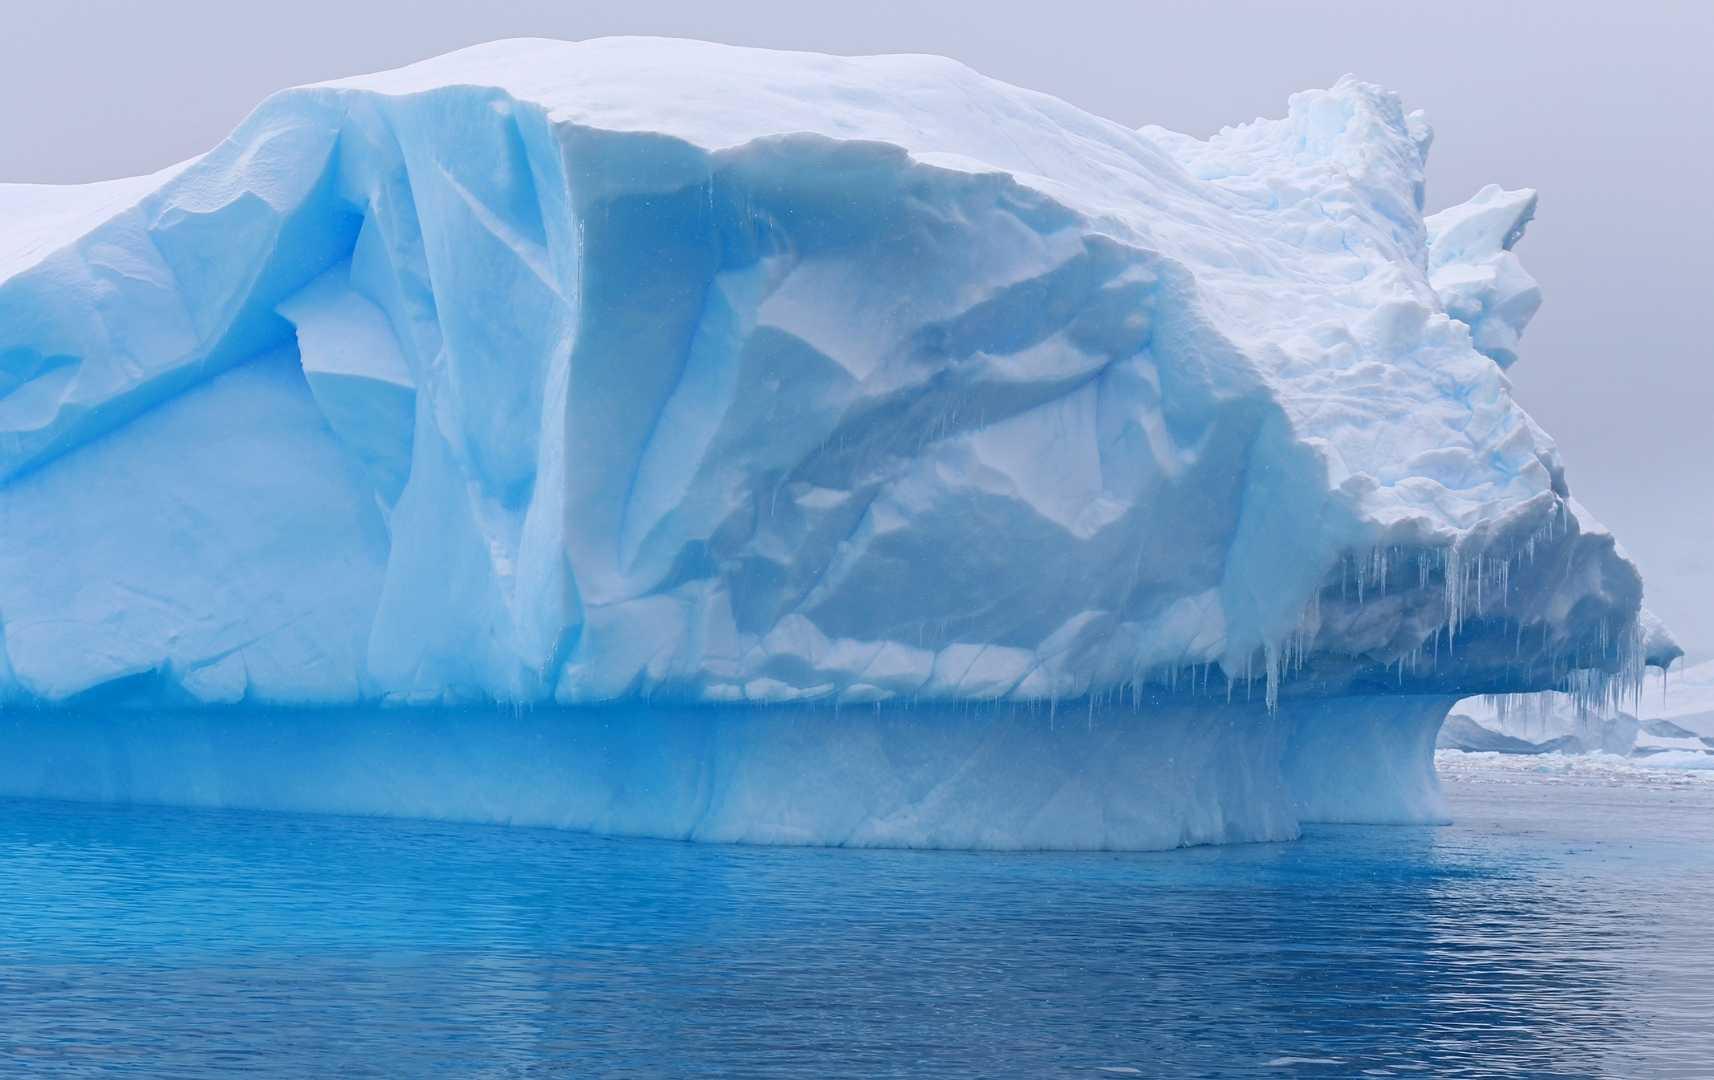 Cierva Cove: Eisblock im Meer, Antarktis